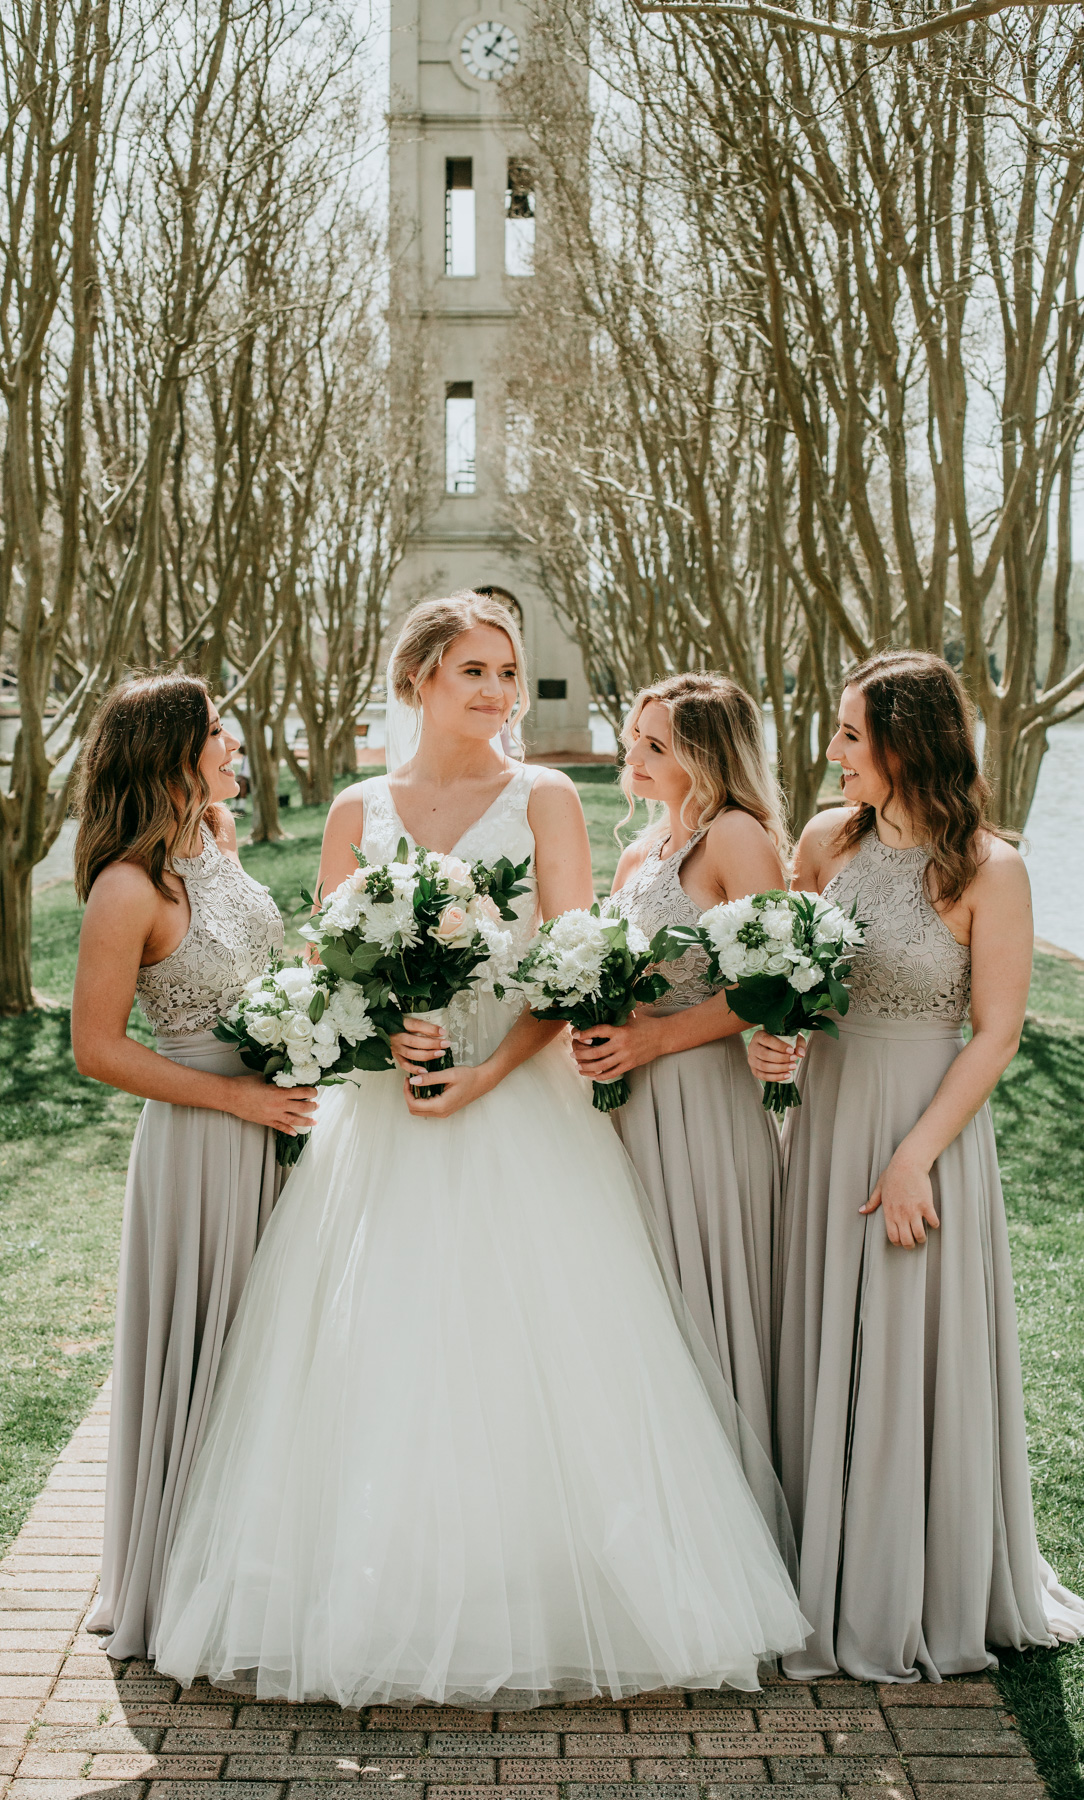 bride-and-bridesmaids-photo.jpg